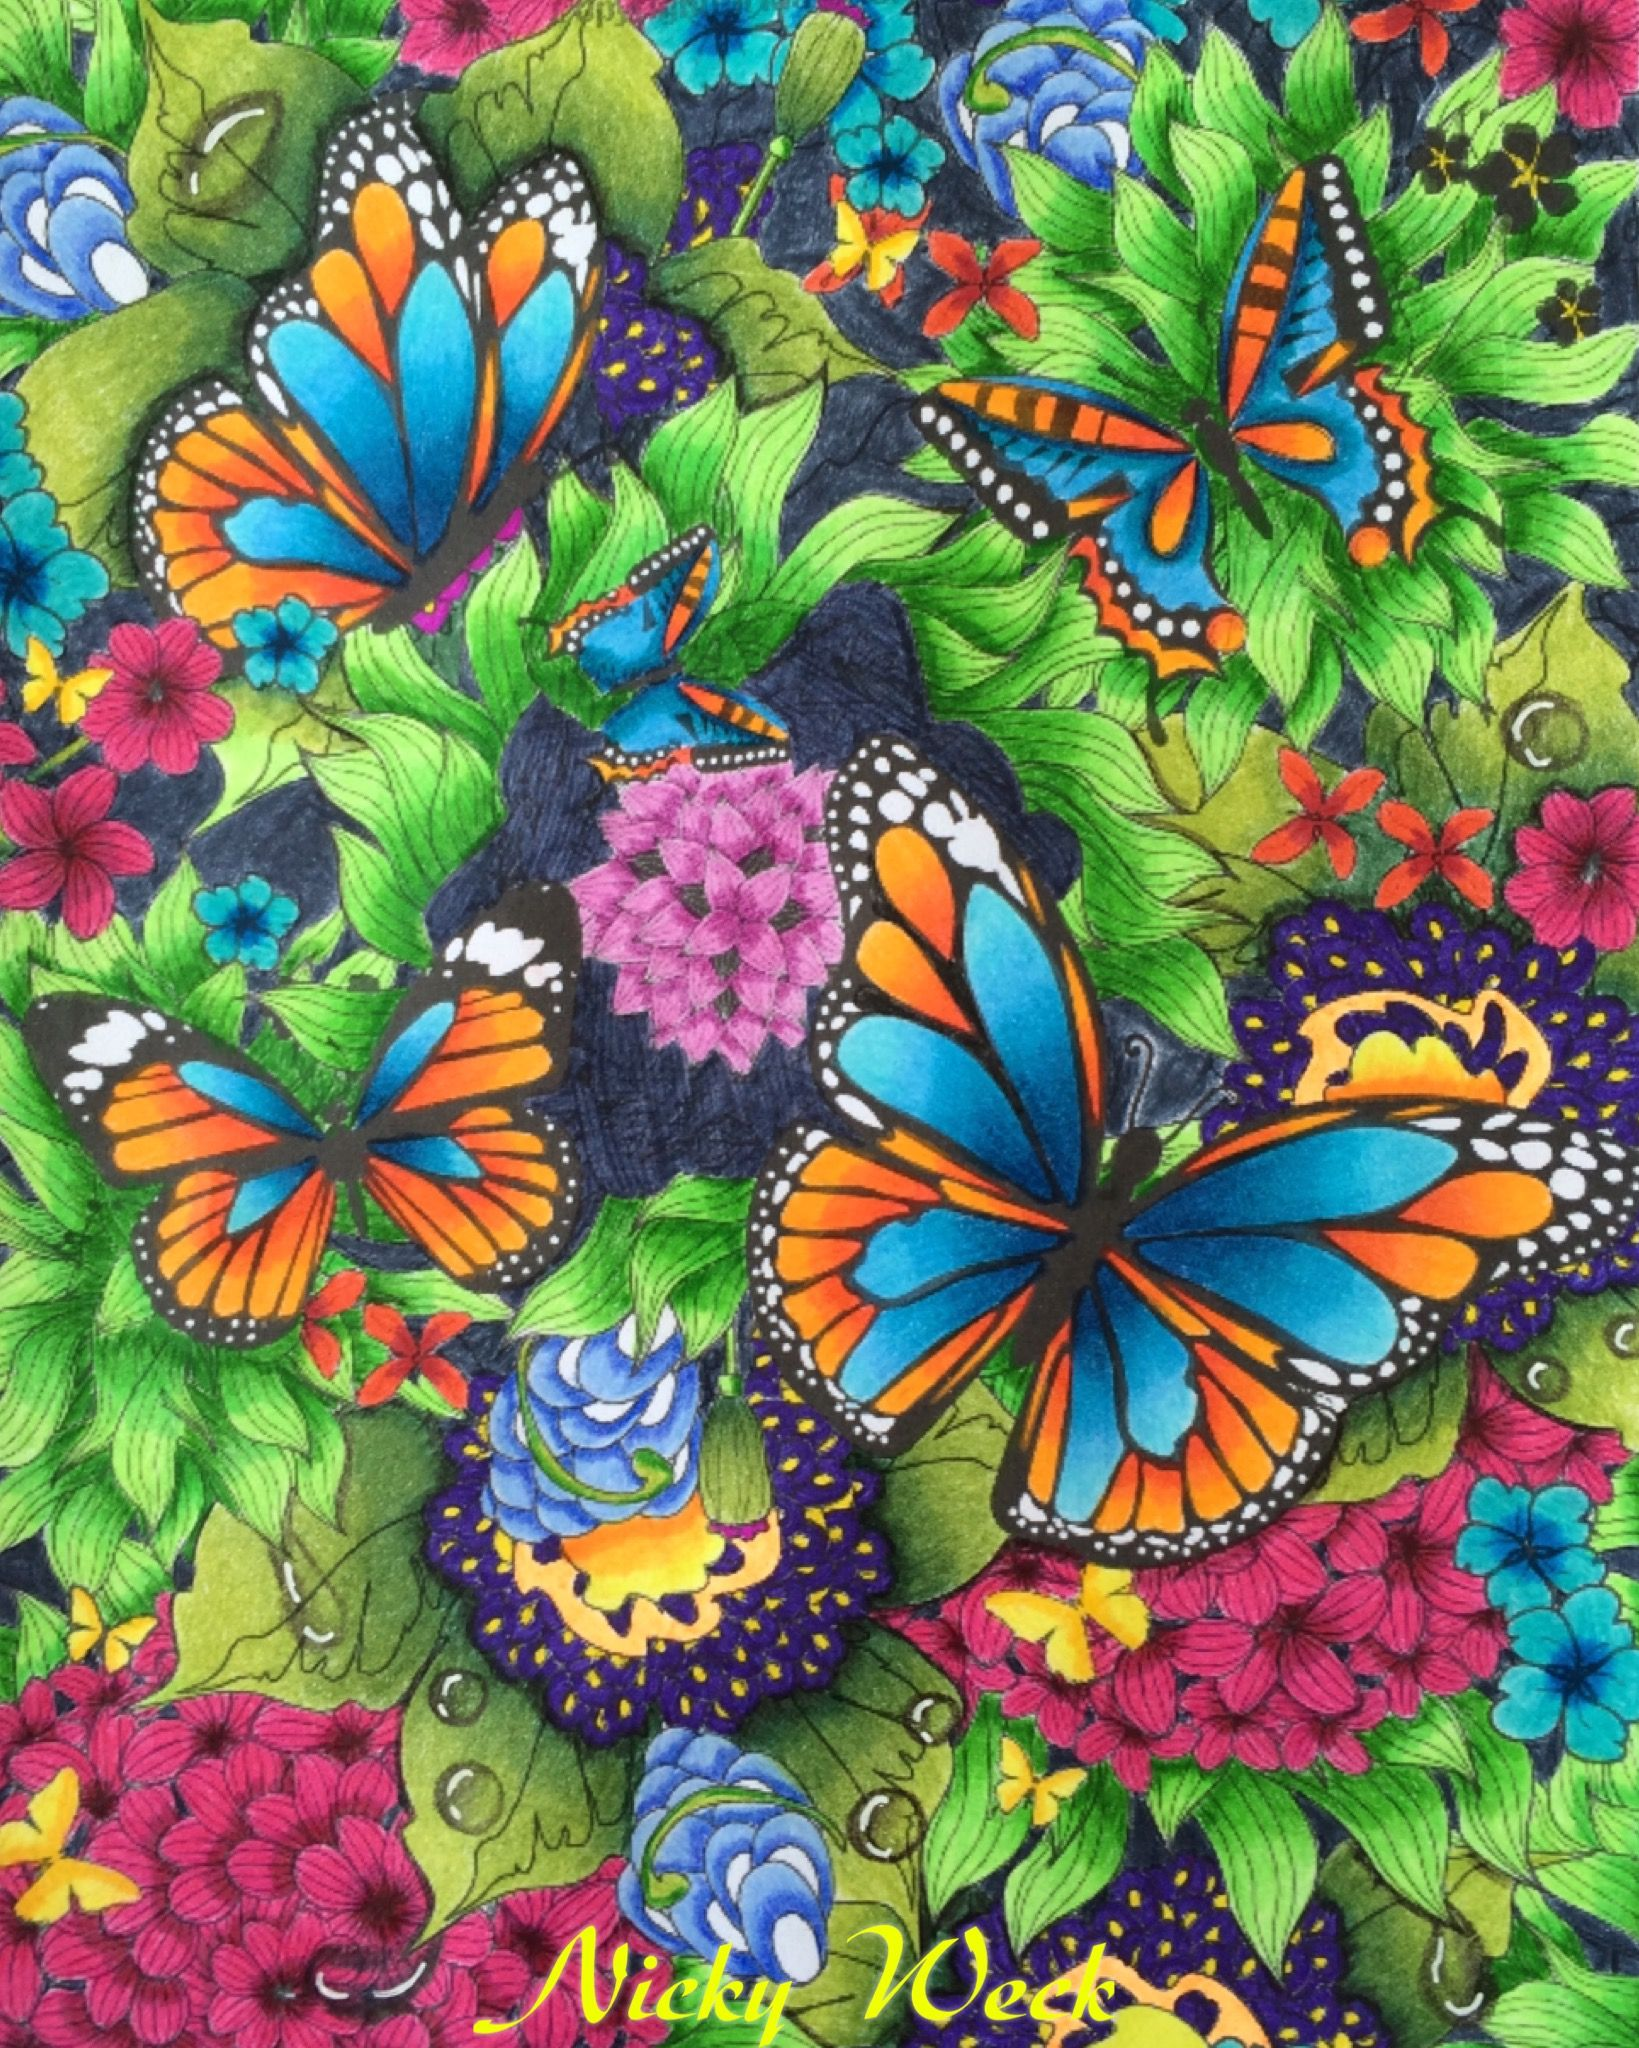 Tropisch Regenwoud My Butterfly Treasure Chest Pretty